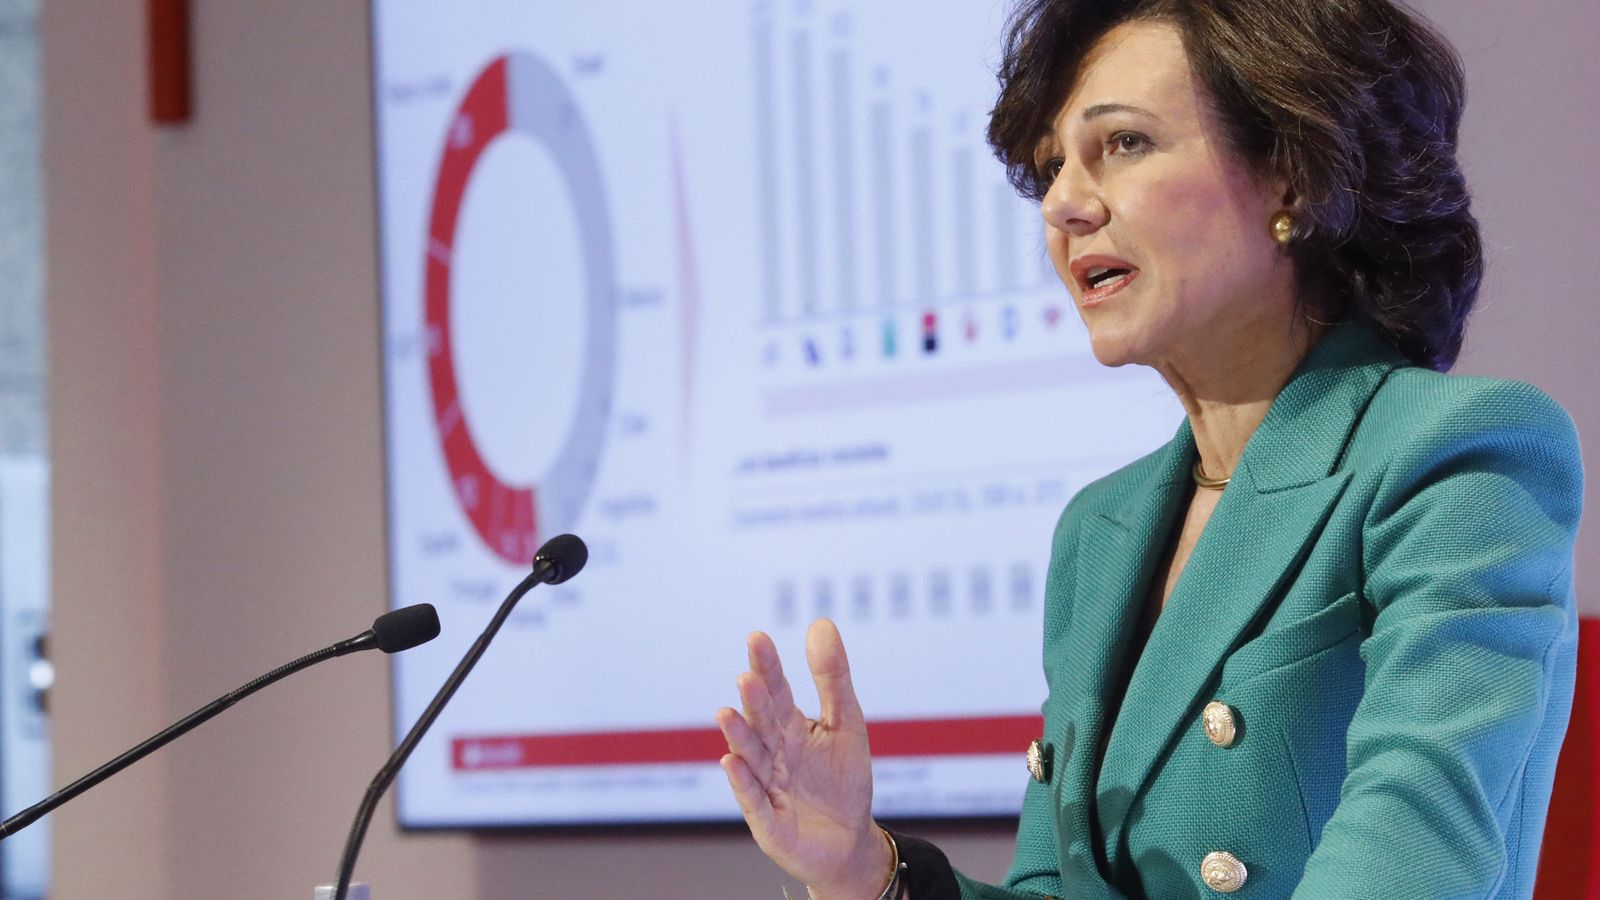 Foto: La presidenta del Santander, Ana Botín. (EFE)